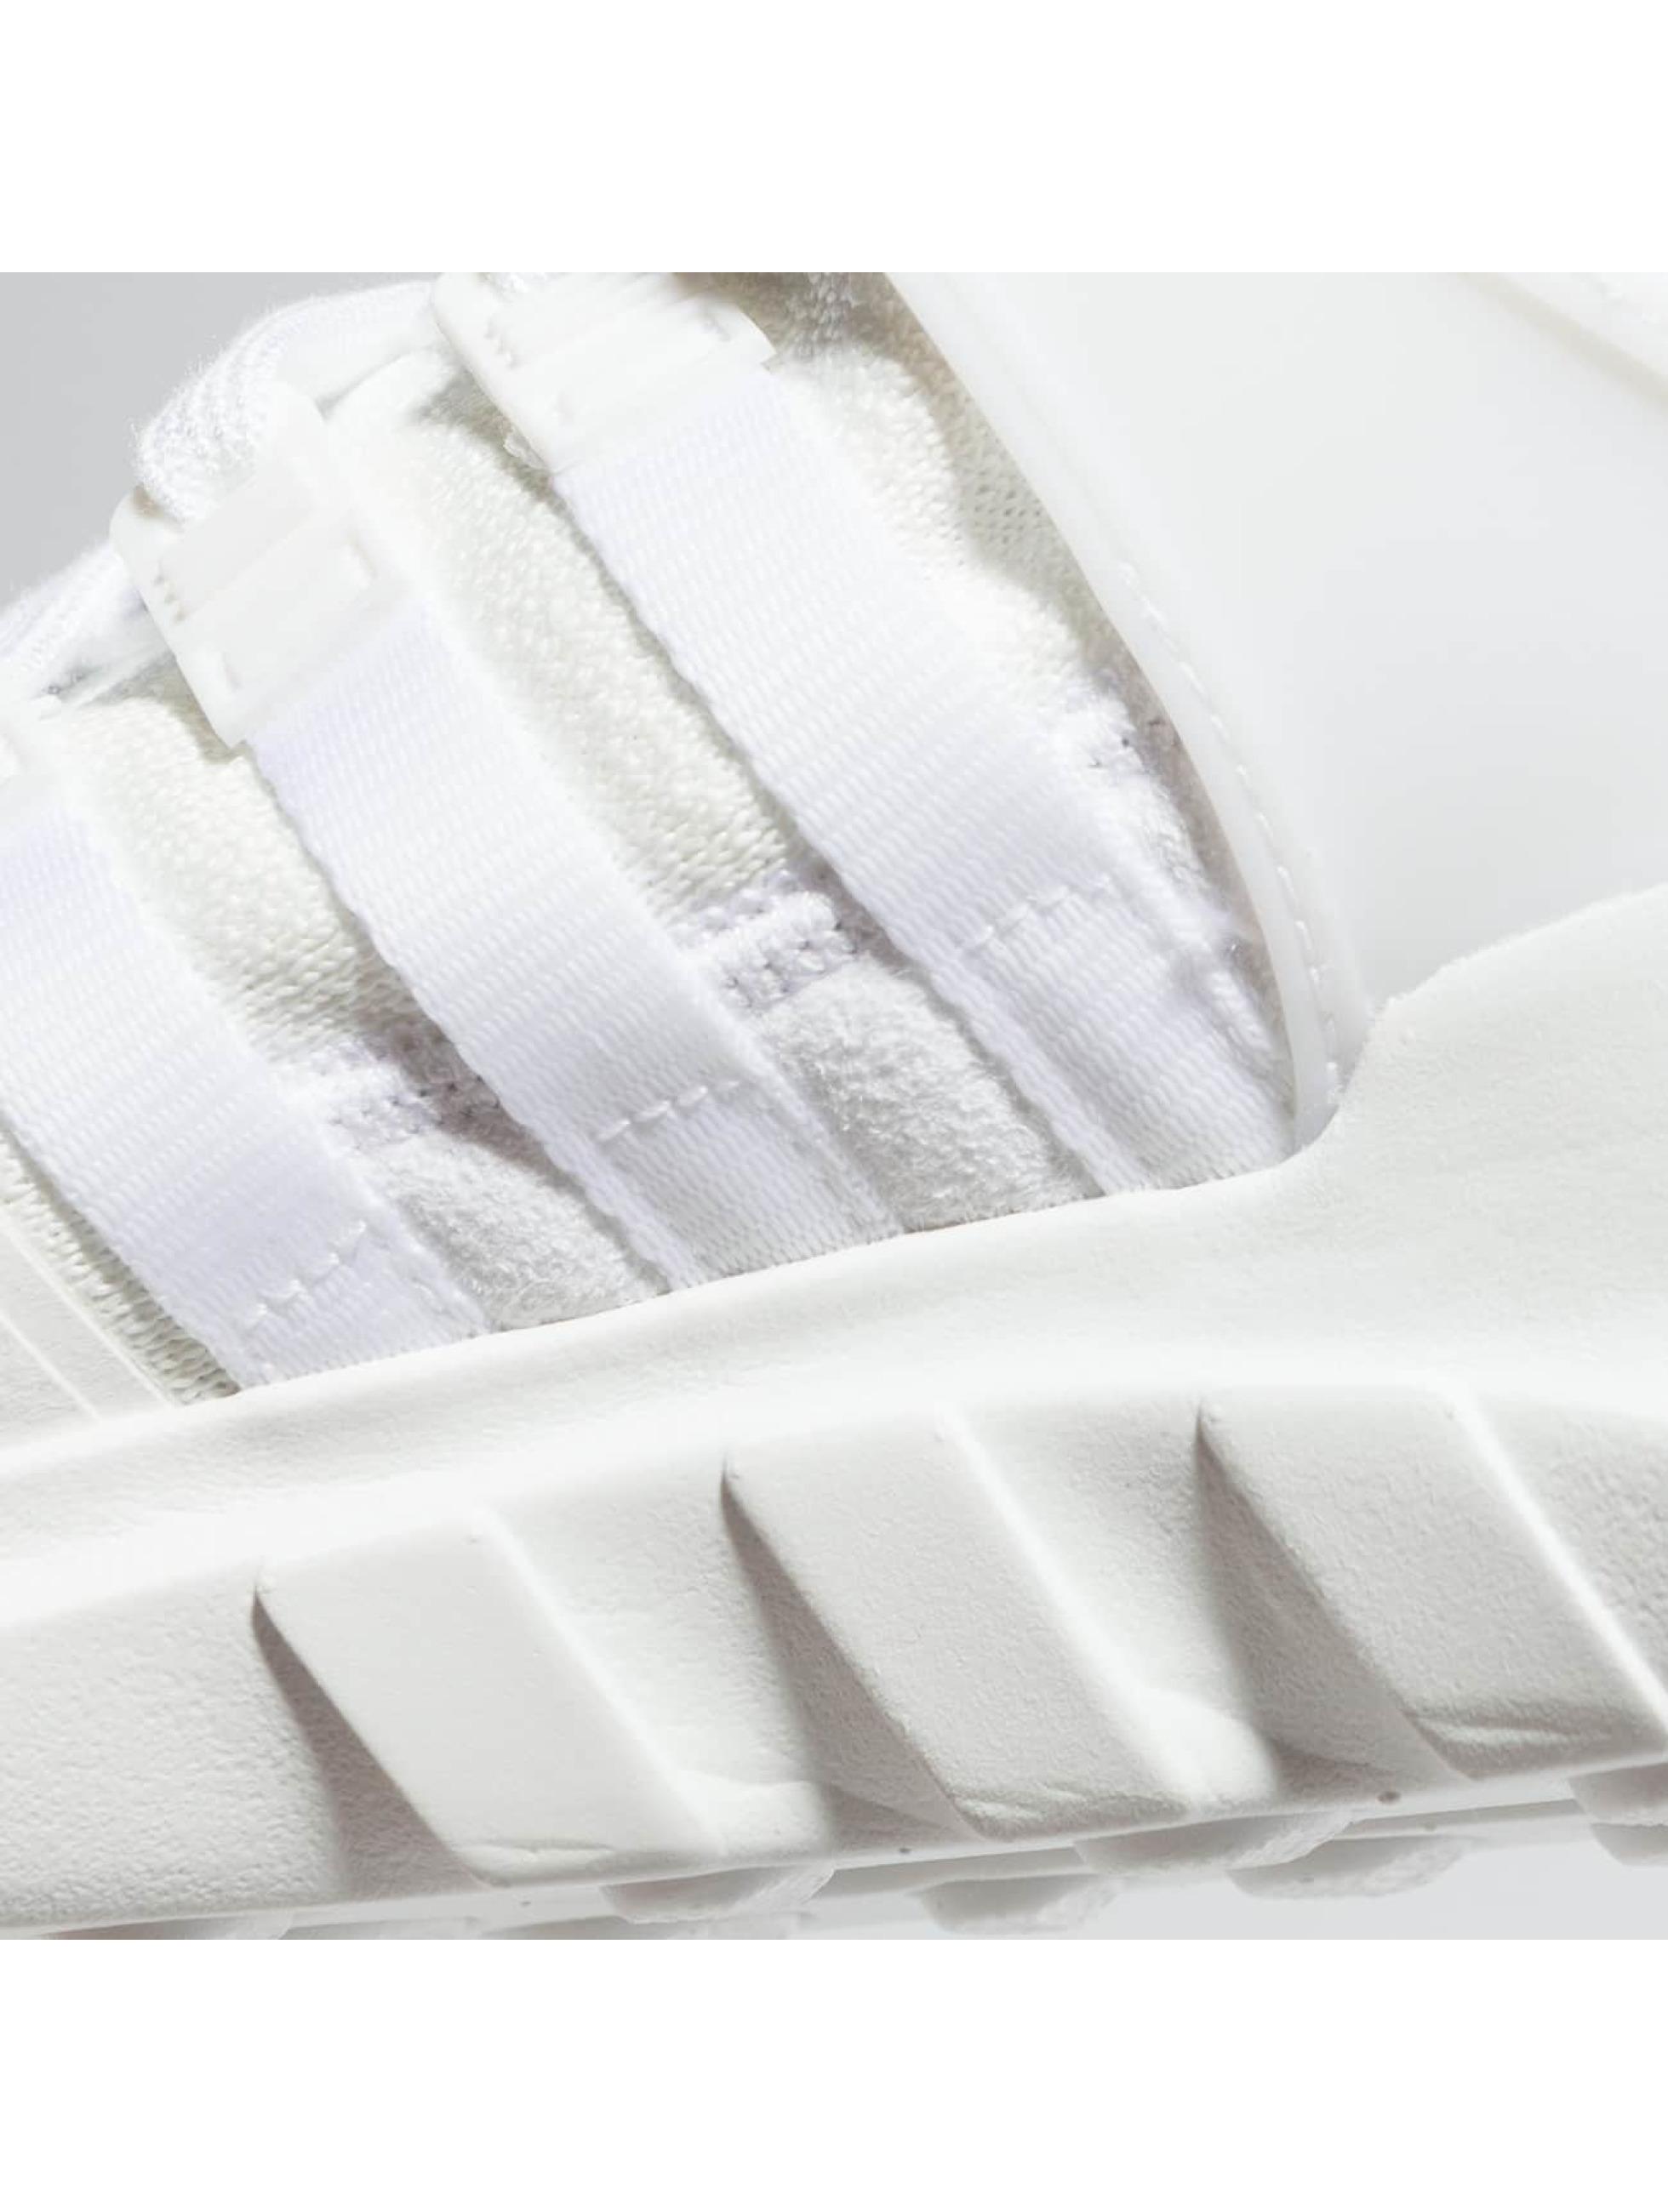 adidas originals Tøysko Equipment Support ADV hvit